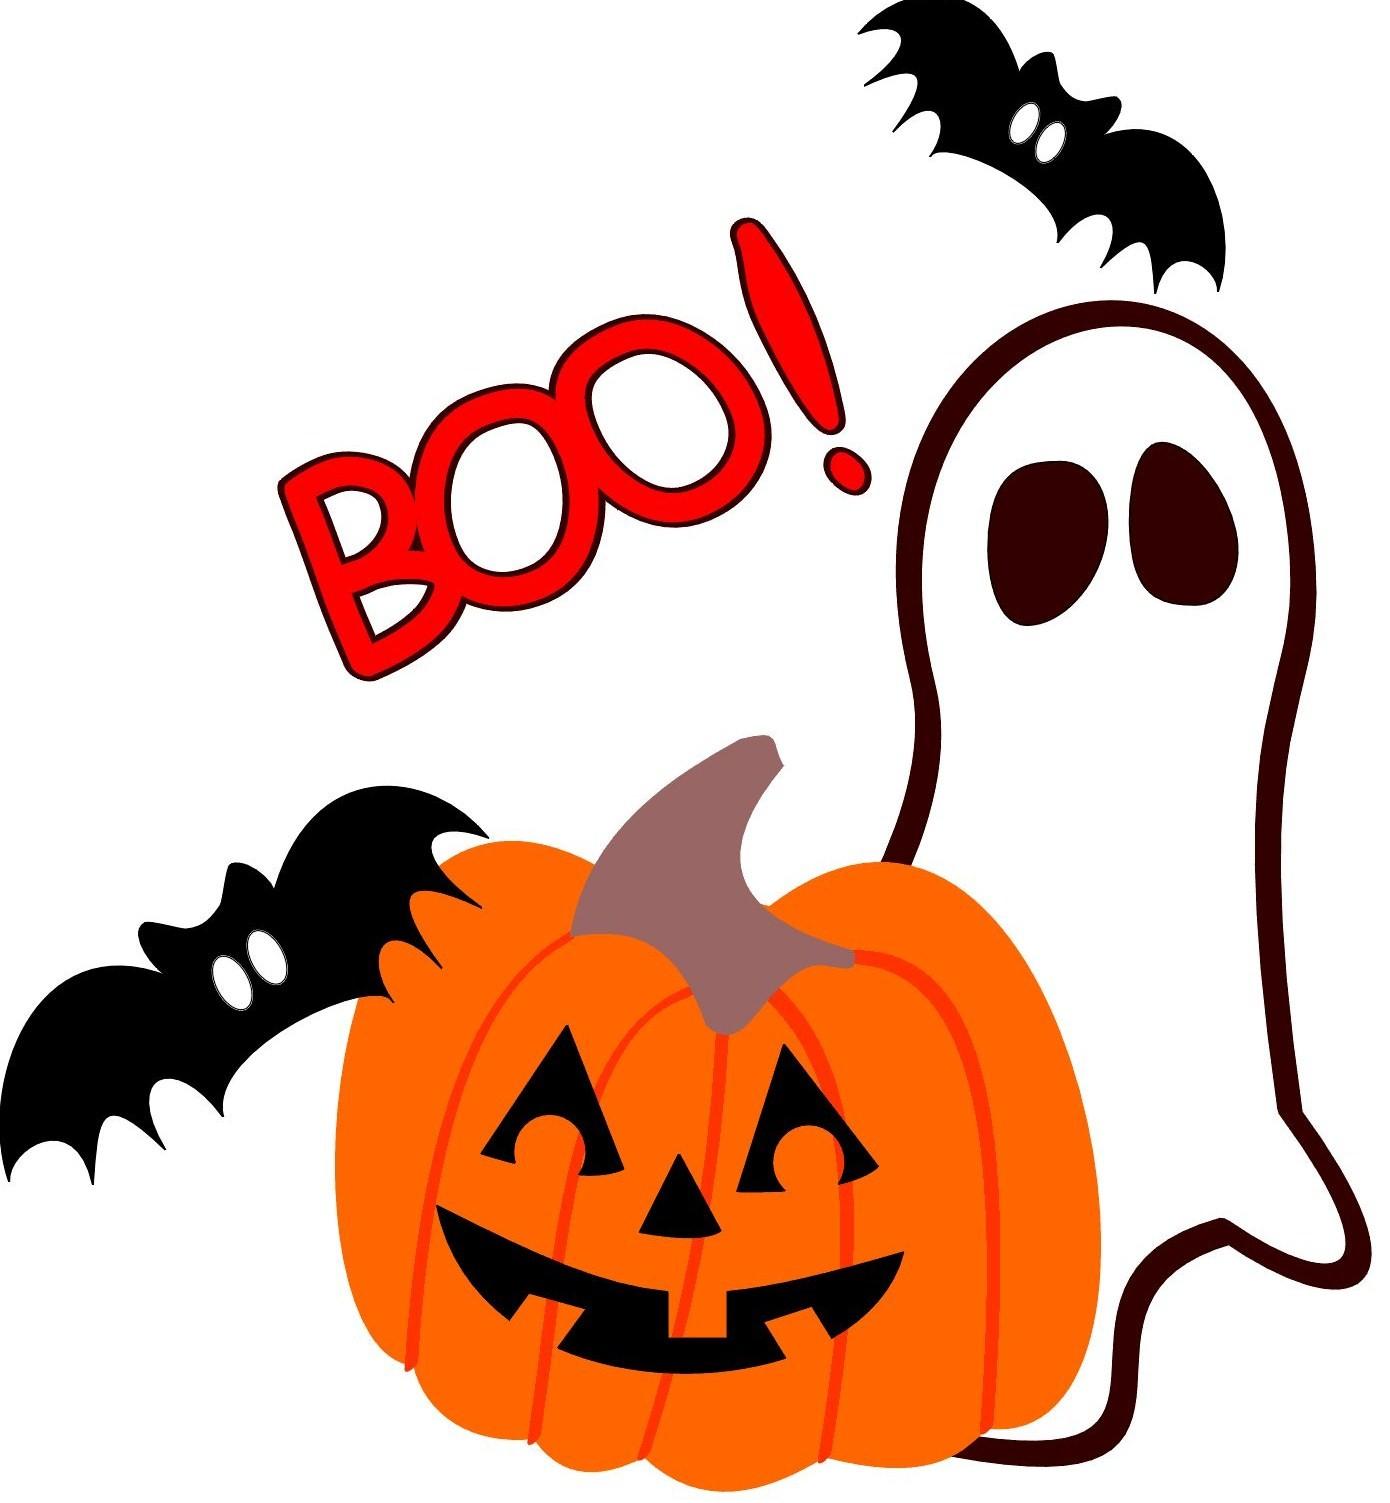 Free halloween free animated halloween clipart halloween s.